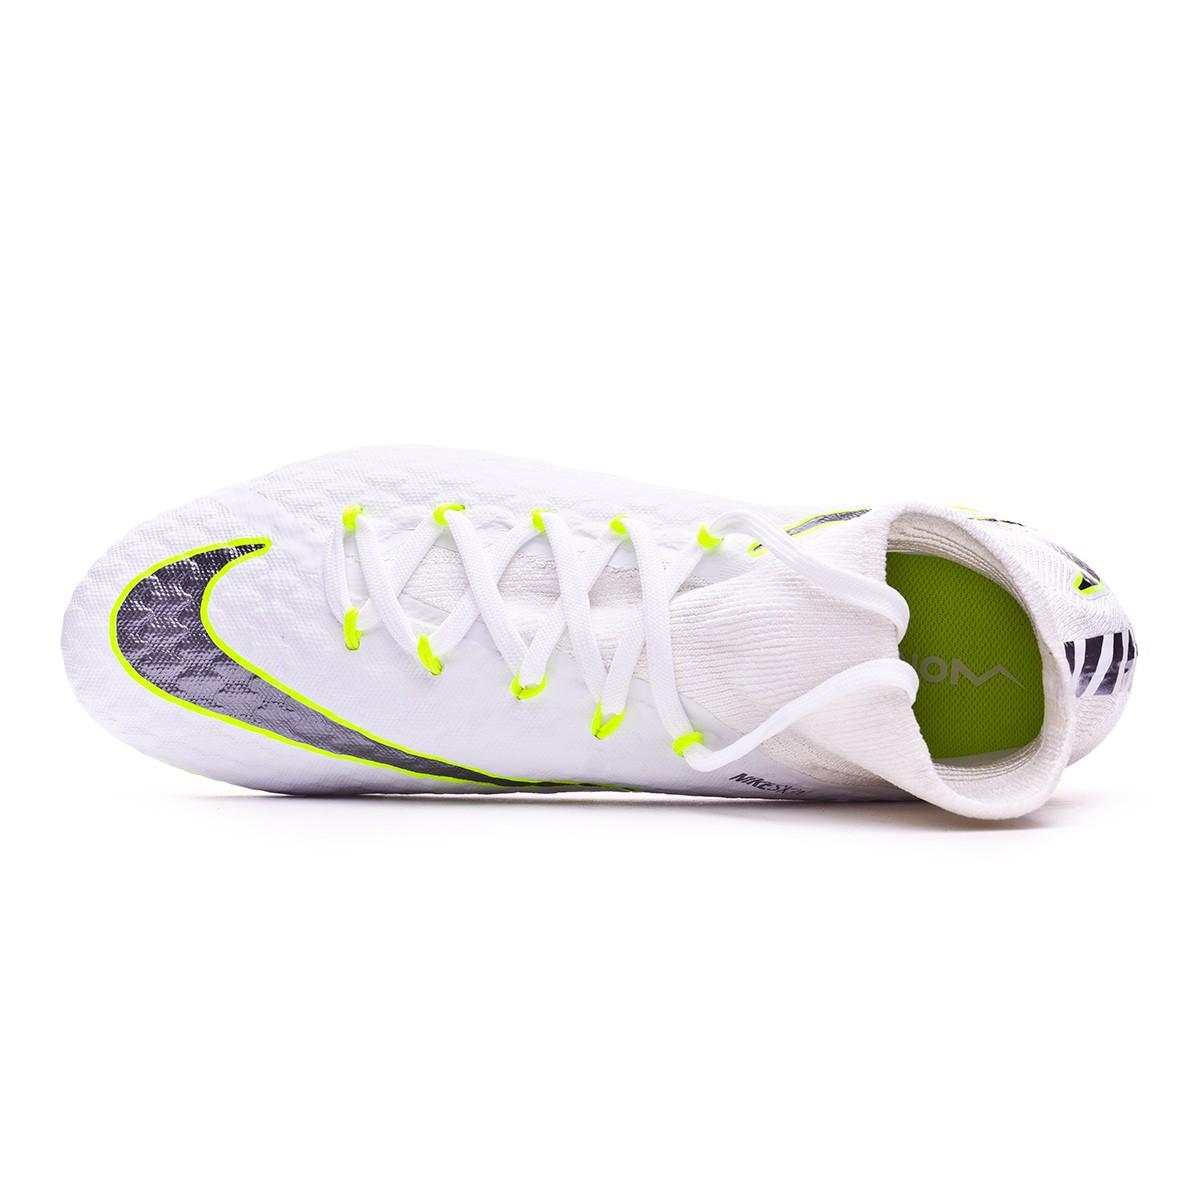 6ea80f220 Football Boots Nike Hypervenom Phantom III Pro DF FG White-Metallic cool  grey-Volt-Metallic cool g - Football store Fútbol Emotion